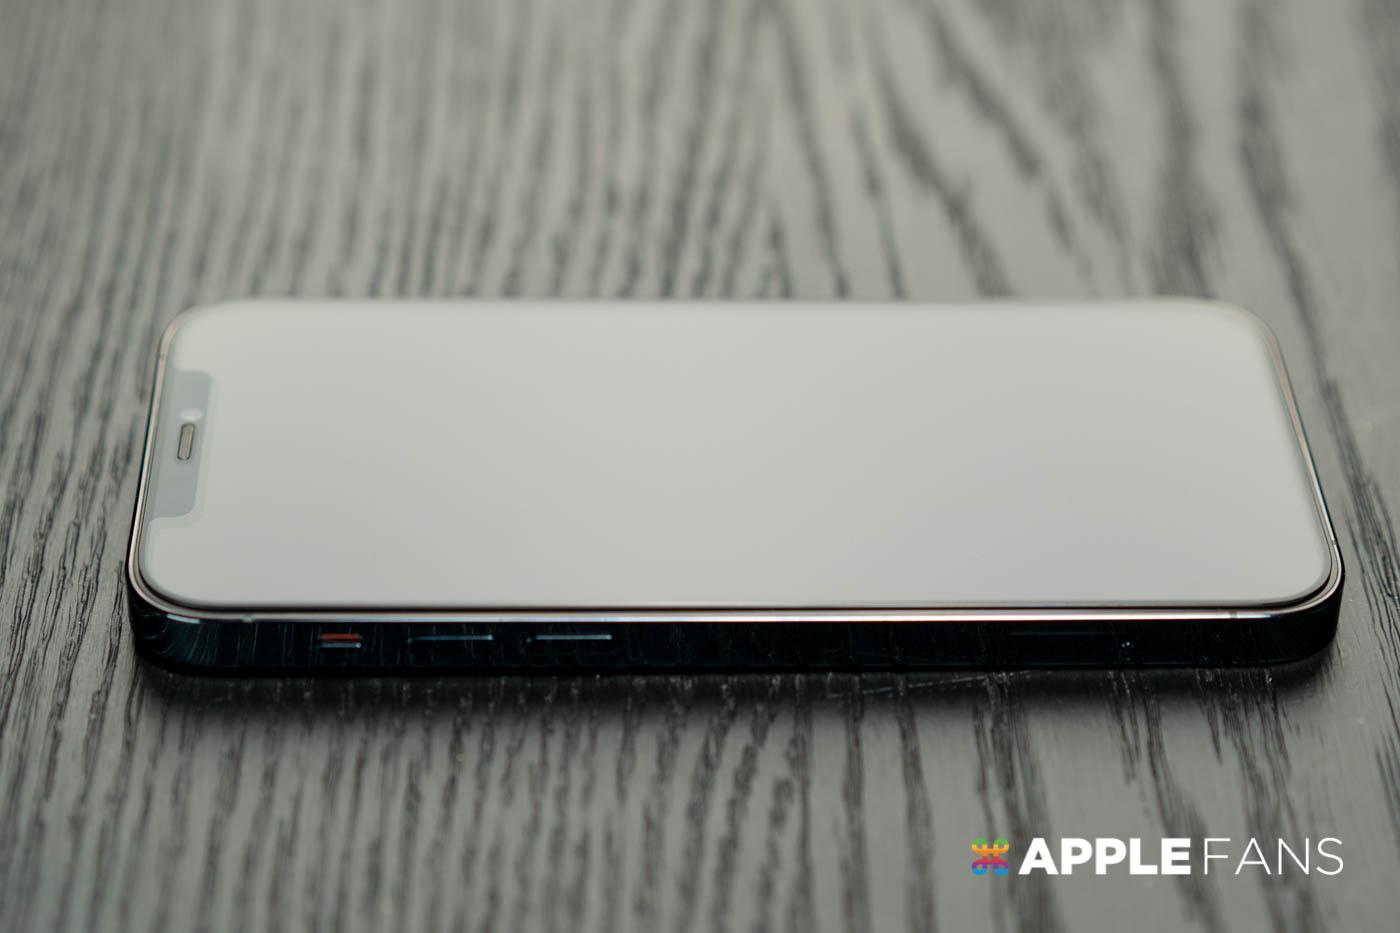 AppleFans